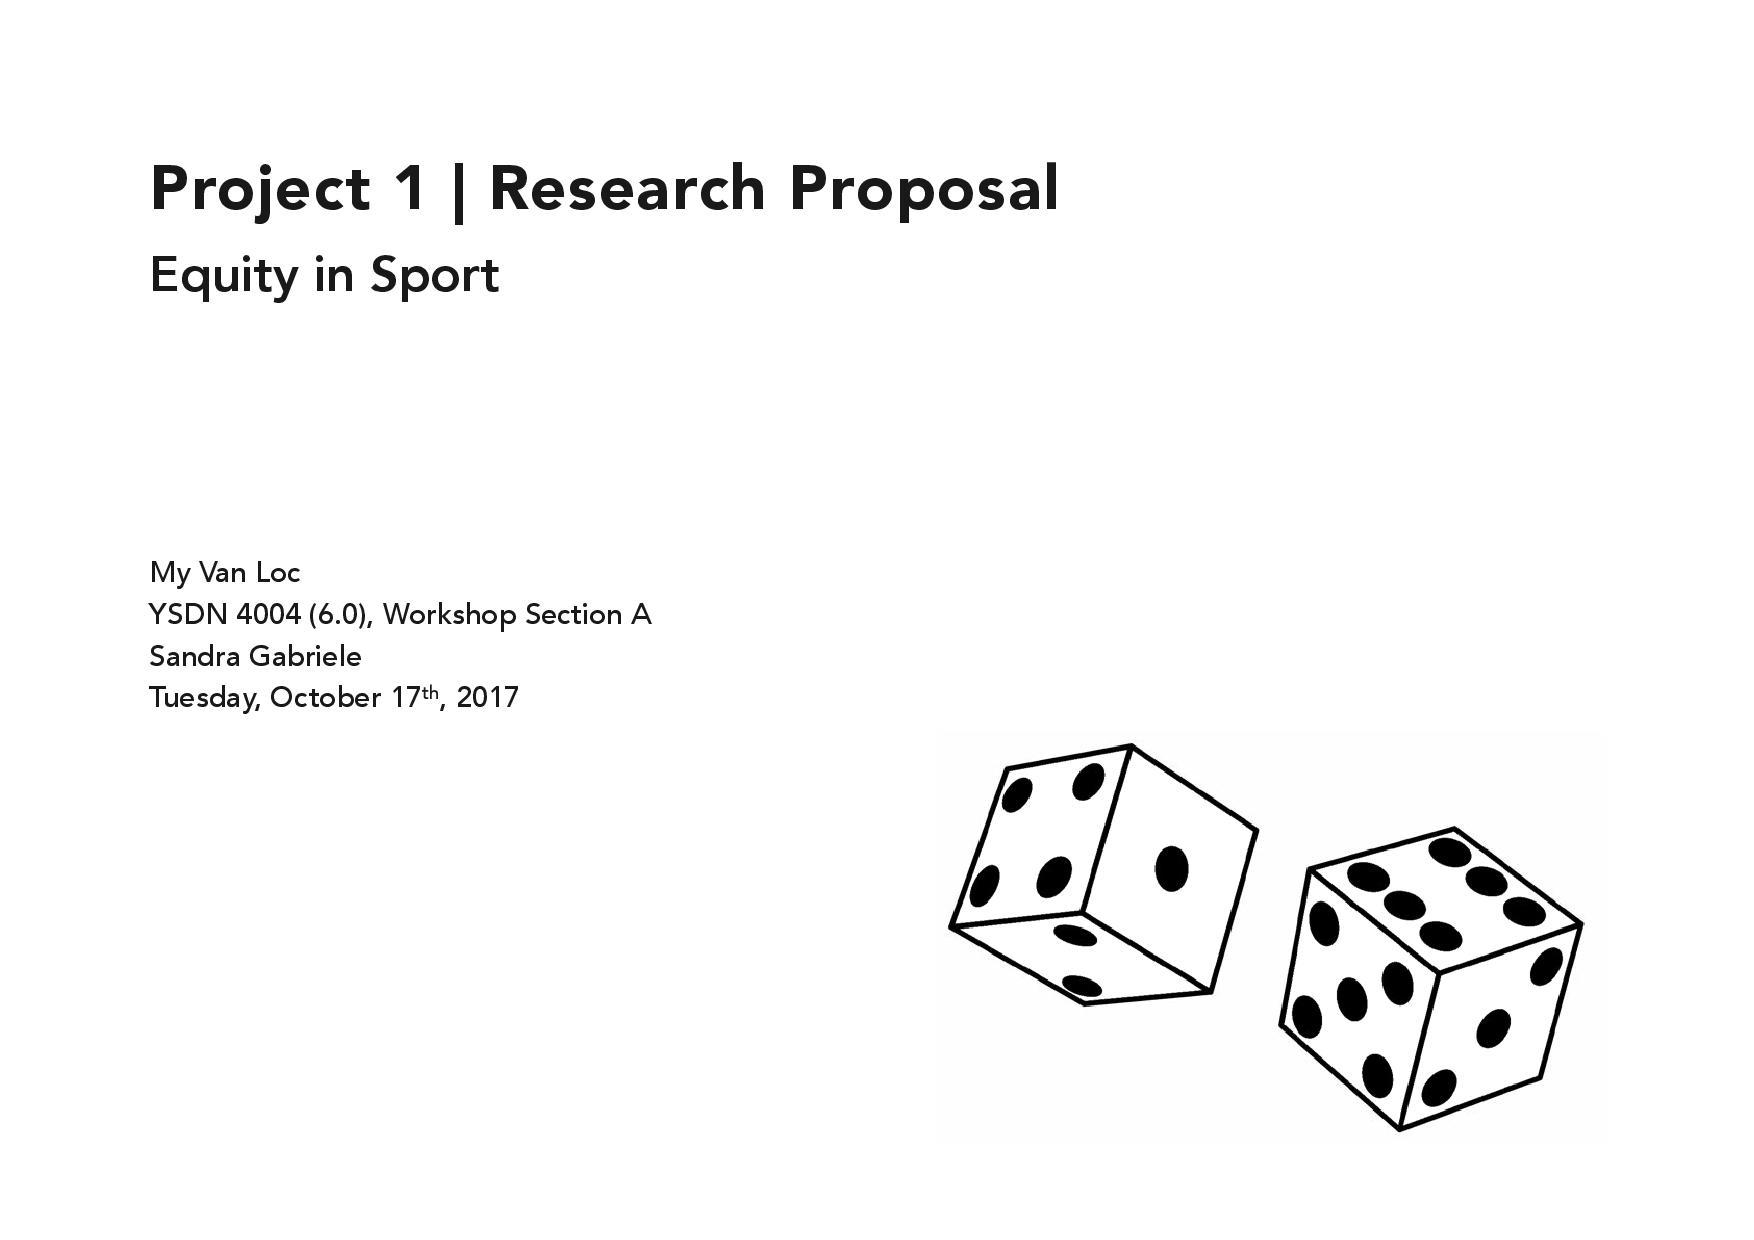 LocMy_ysdn4004_pr1_proposal-page-001.jpg